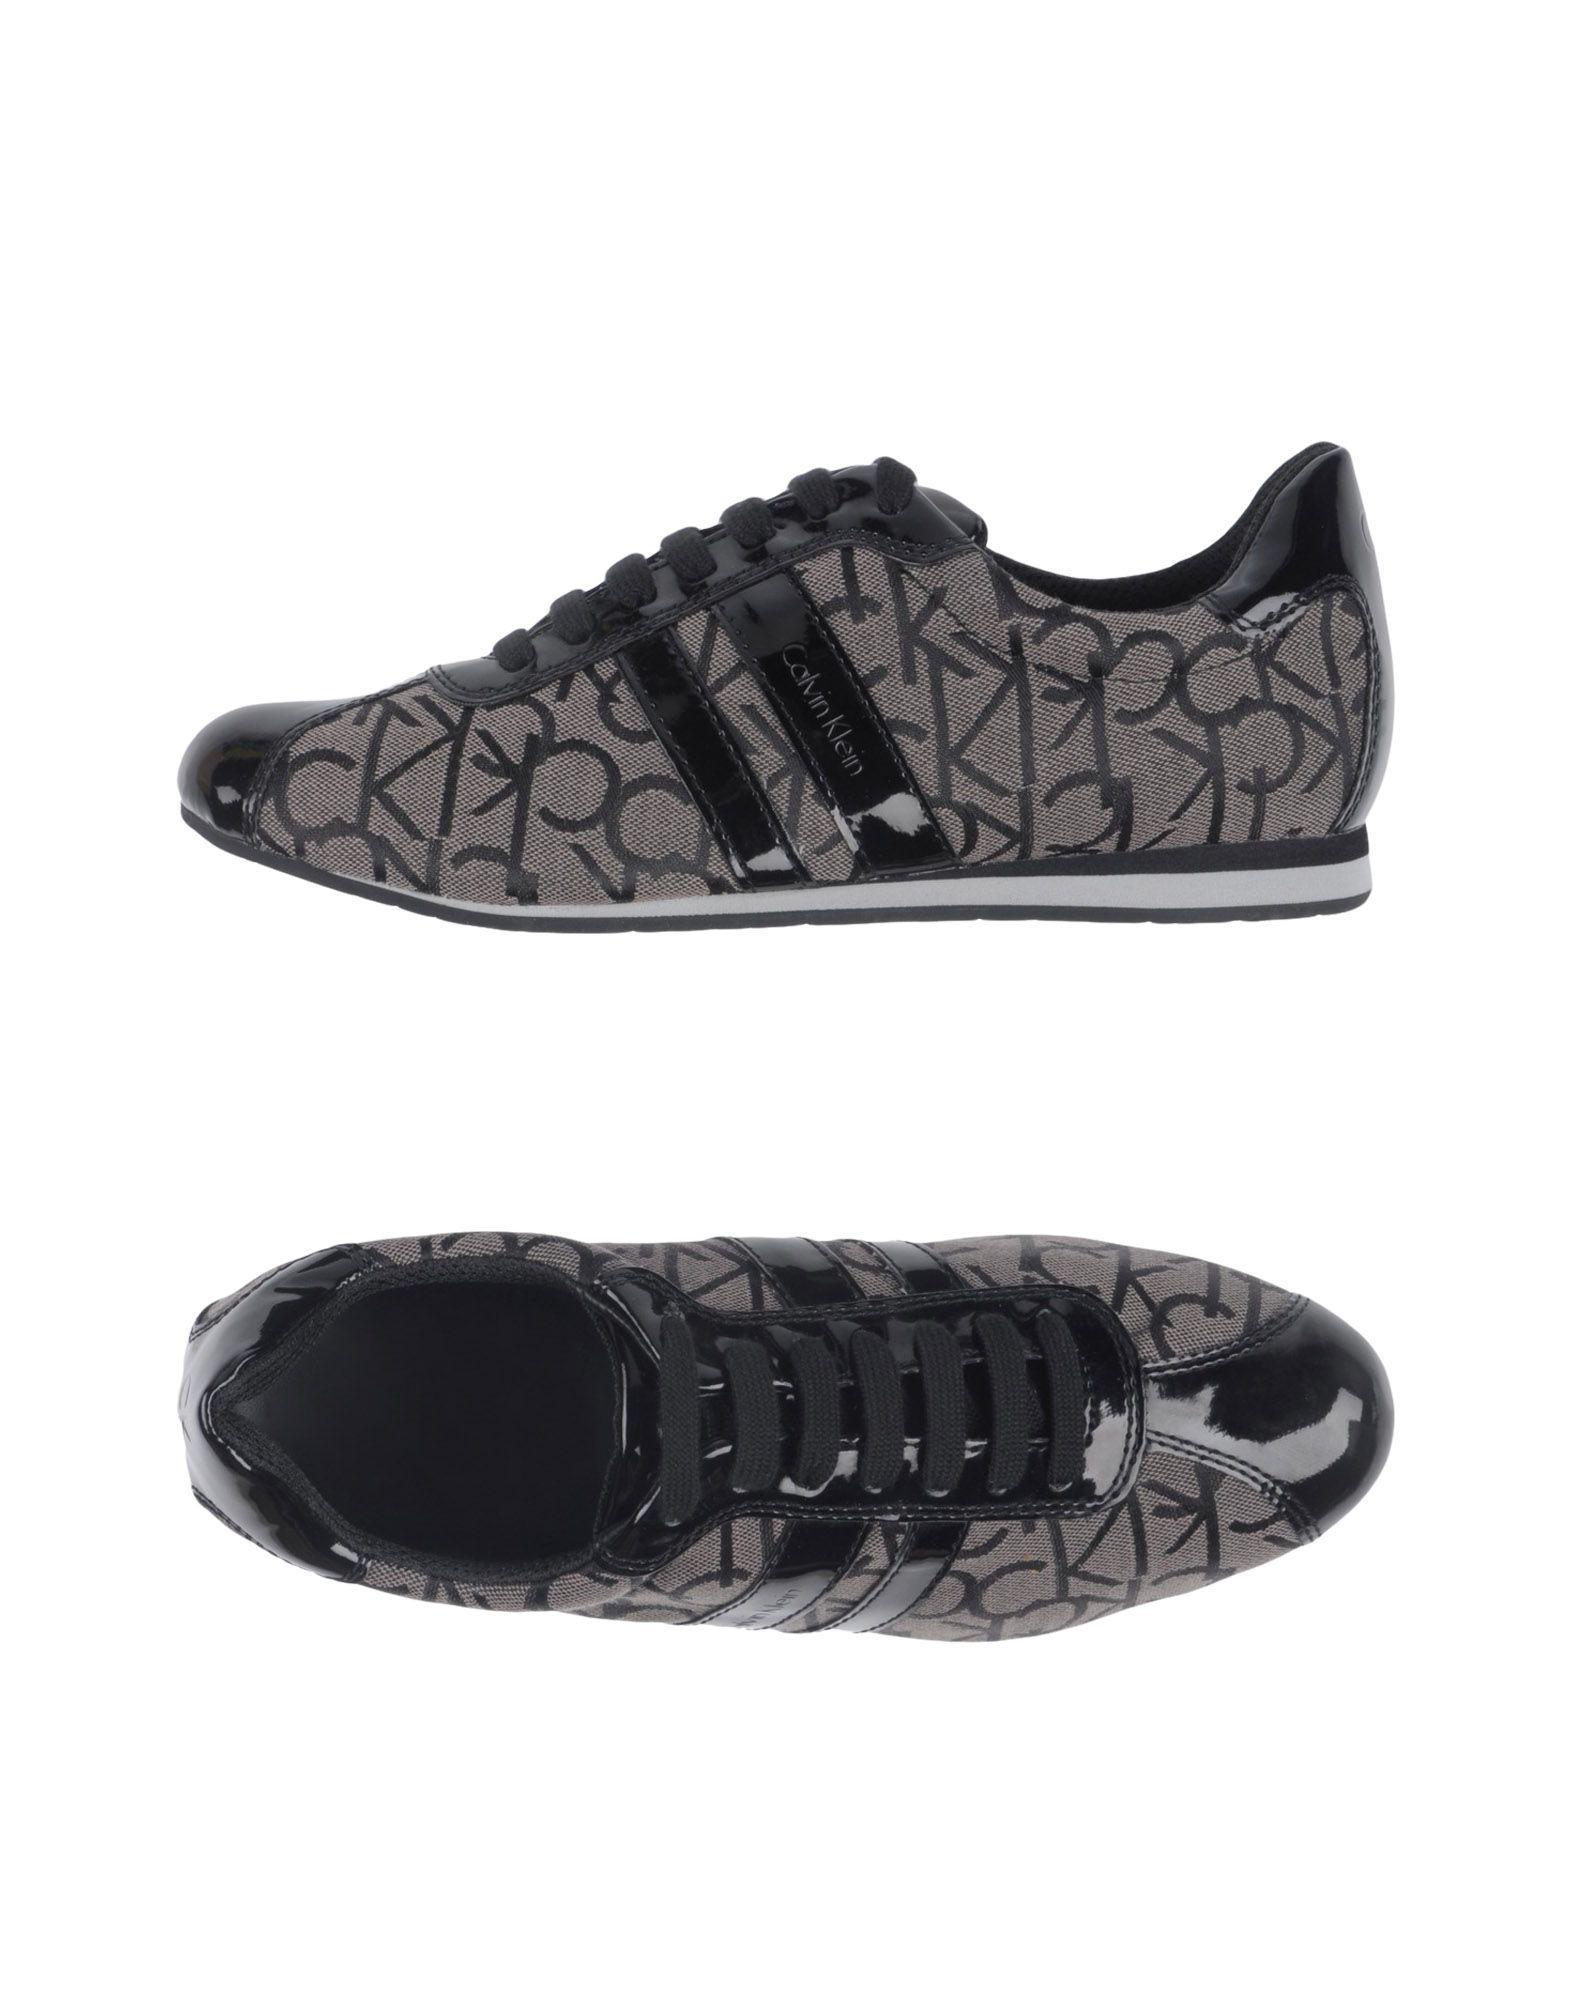 FOOTWEAR - Low-tops & sneakers Calvin Klein LUQ20L5